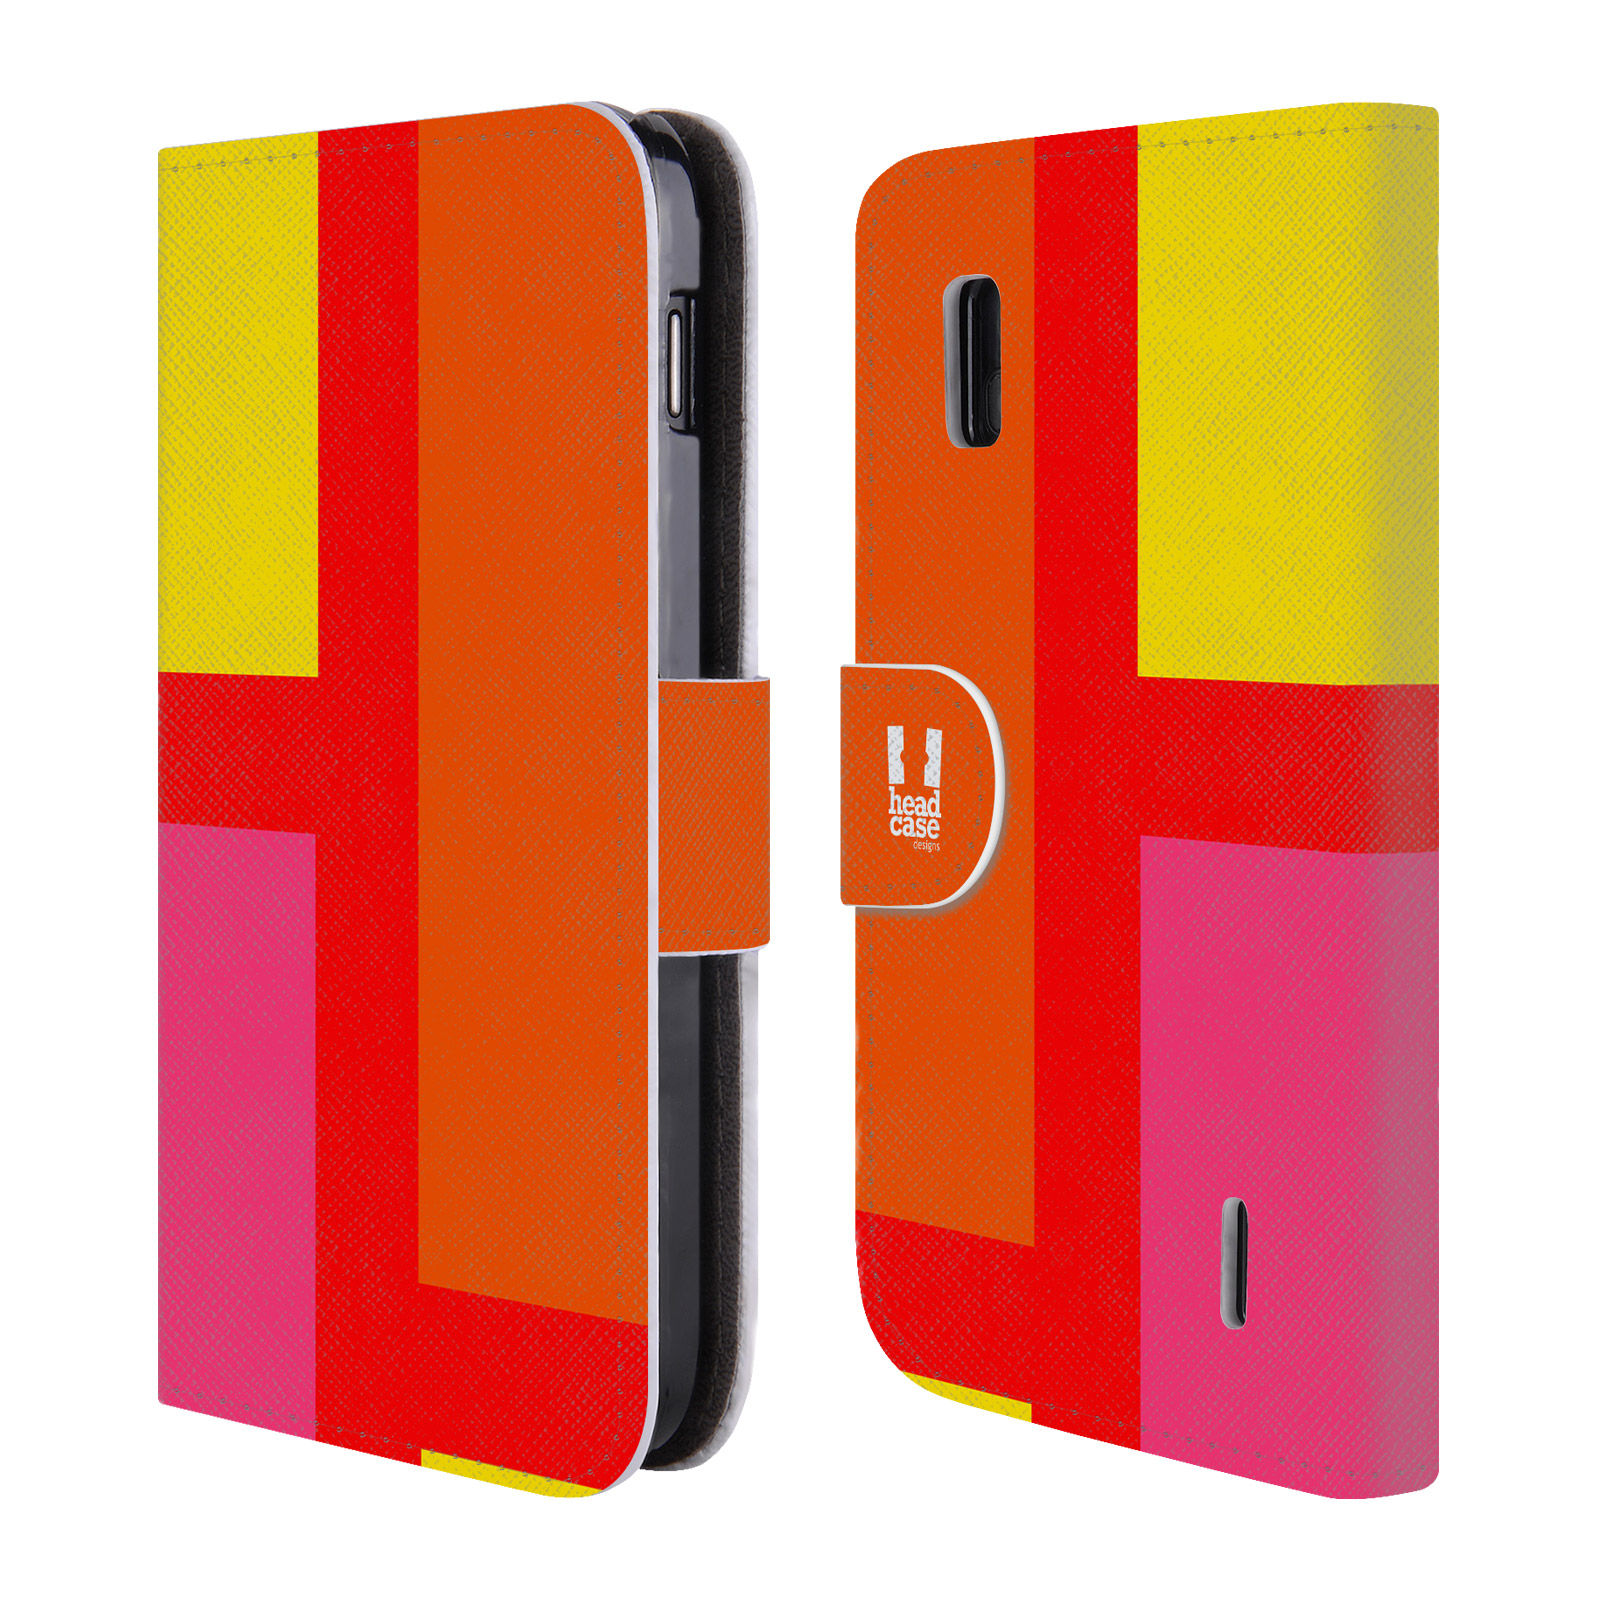 HEAD CASE Flipové pouzdro pro mobil LG NEXUS 4 barevné tvary oranžová ulice